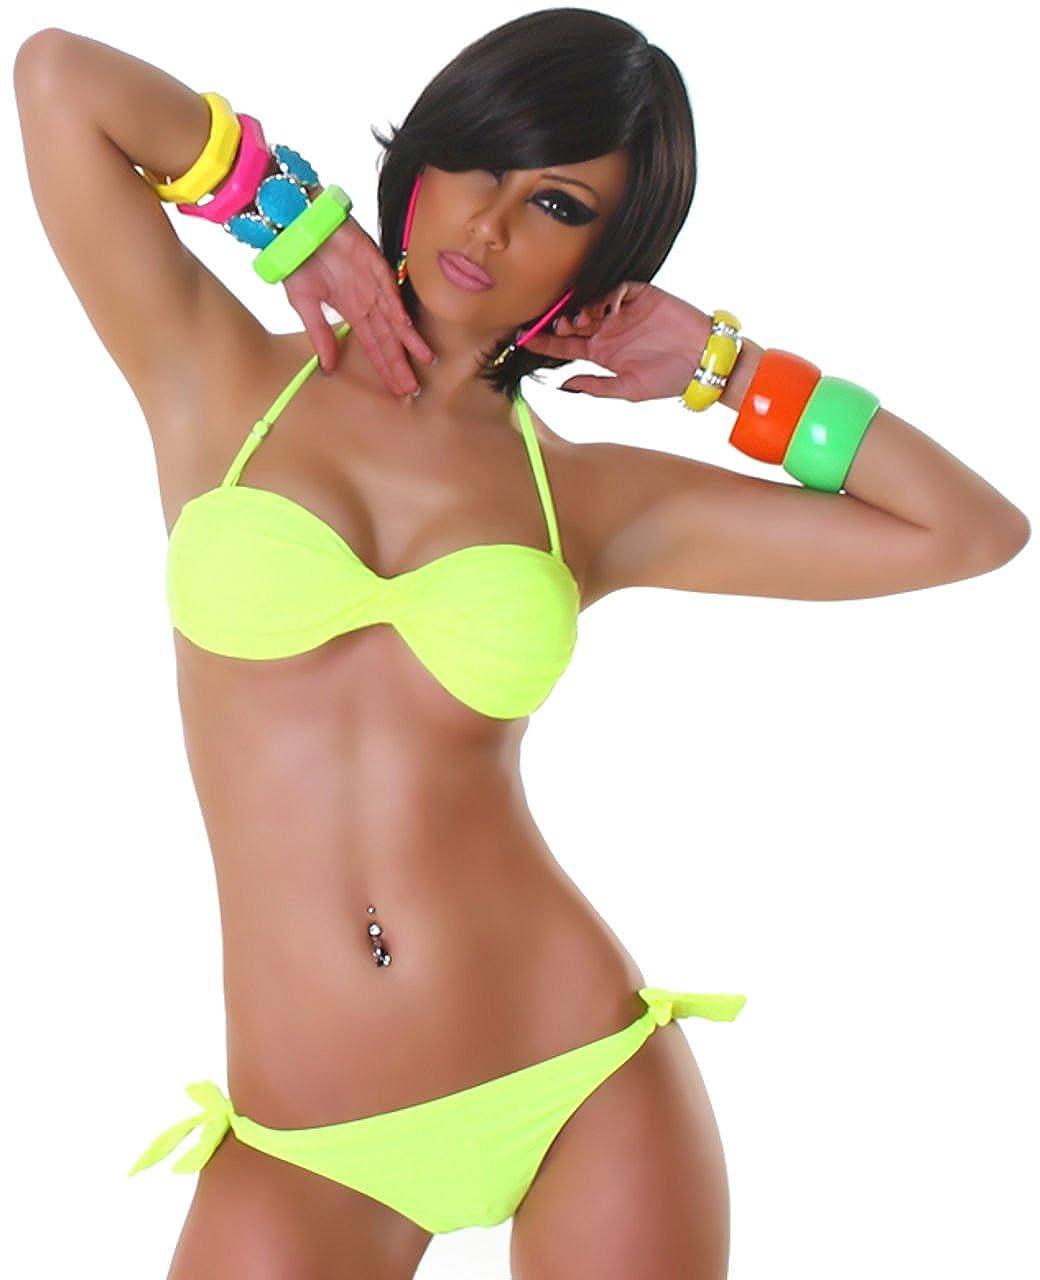 P.F. Damen Bandeau-Neckholder-Bikini im gedrehten Design  Amazon.de   Bekleidung f65c17e5d0